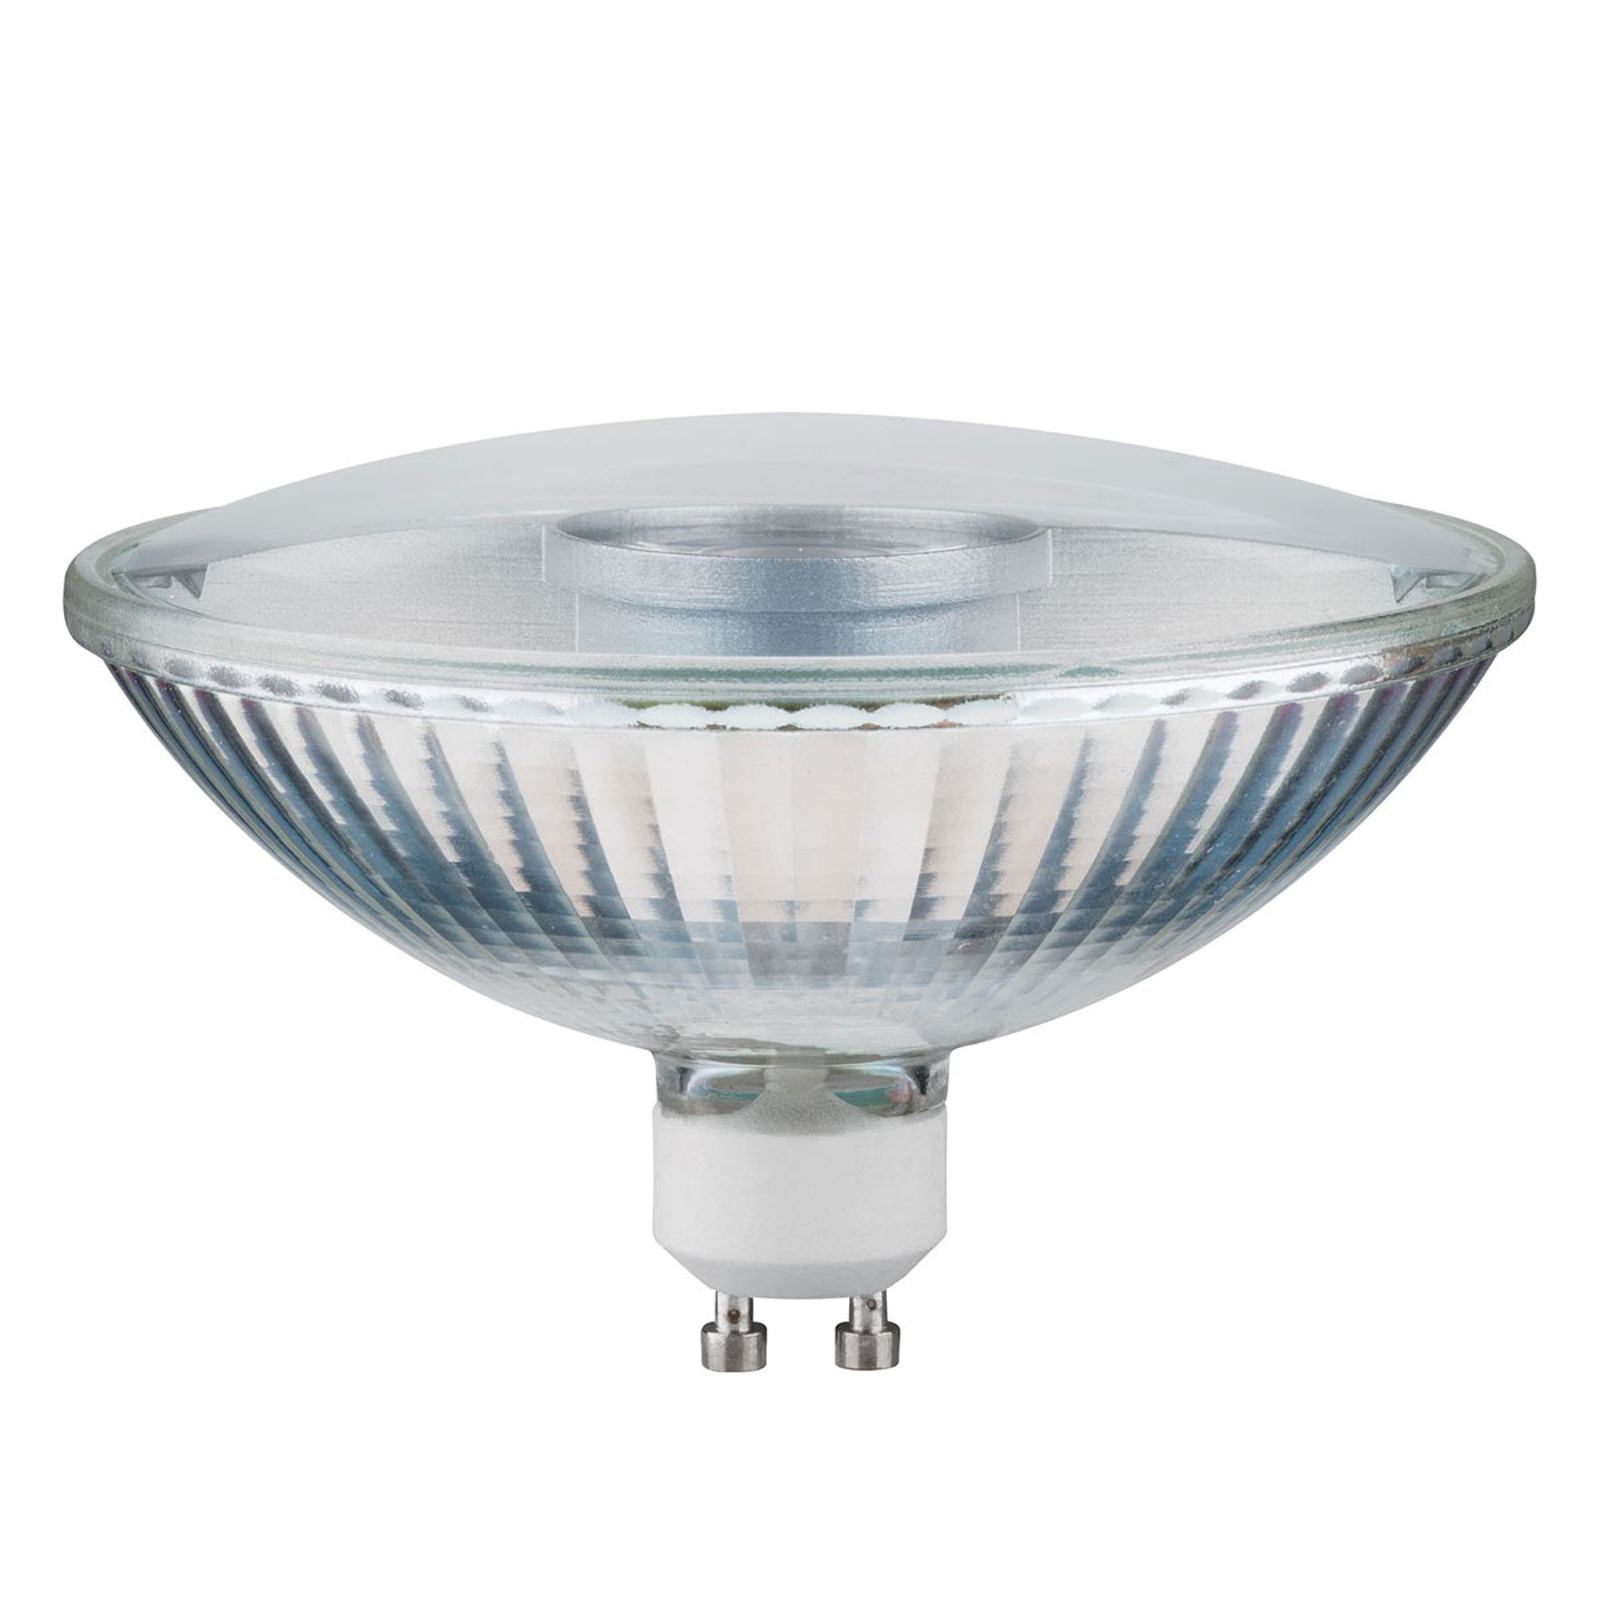 Paulmann LEDa riflettore GU10 QPAR111 4W 2.700K Illuminazione per interni